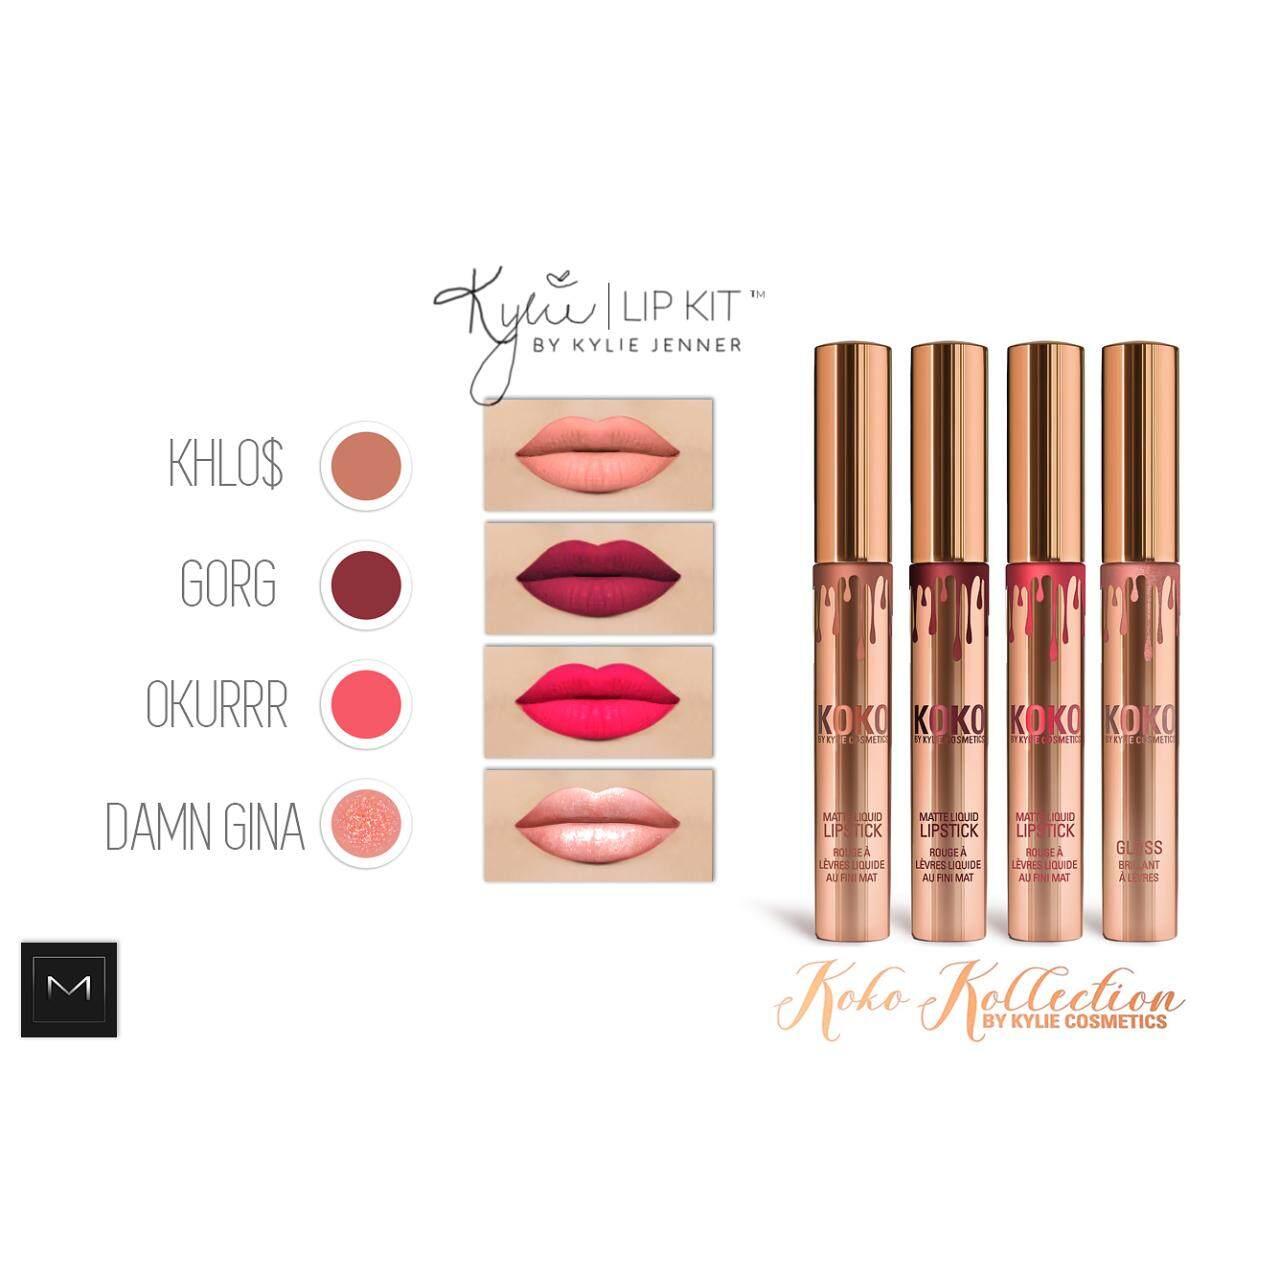 Fitur Mesh Kylie Koko Kollection Lipgloss 4 Pcs Color 1 Pack Pak Set Isi Detail Gambar Matte Lipstick In Terbaru